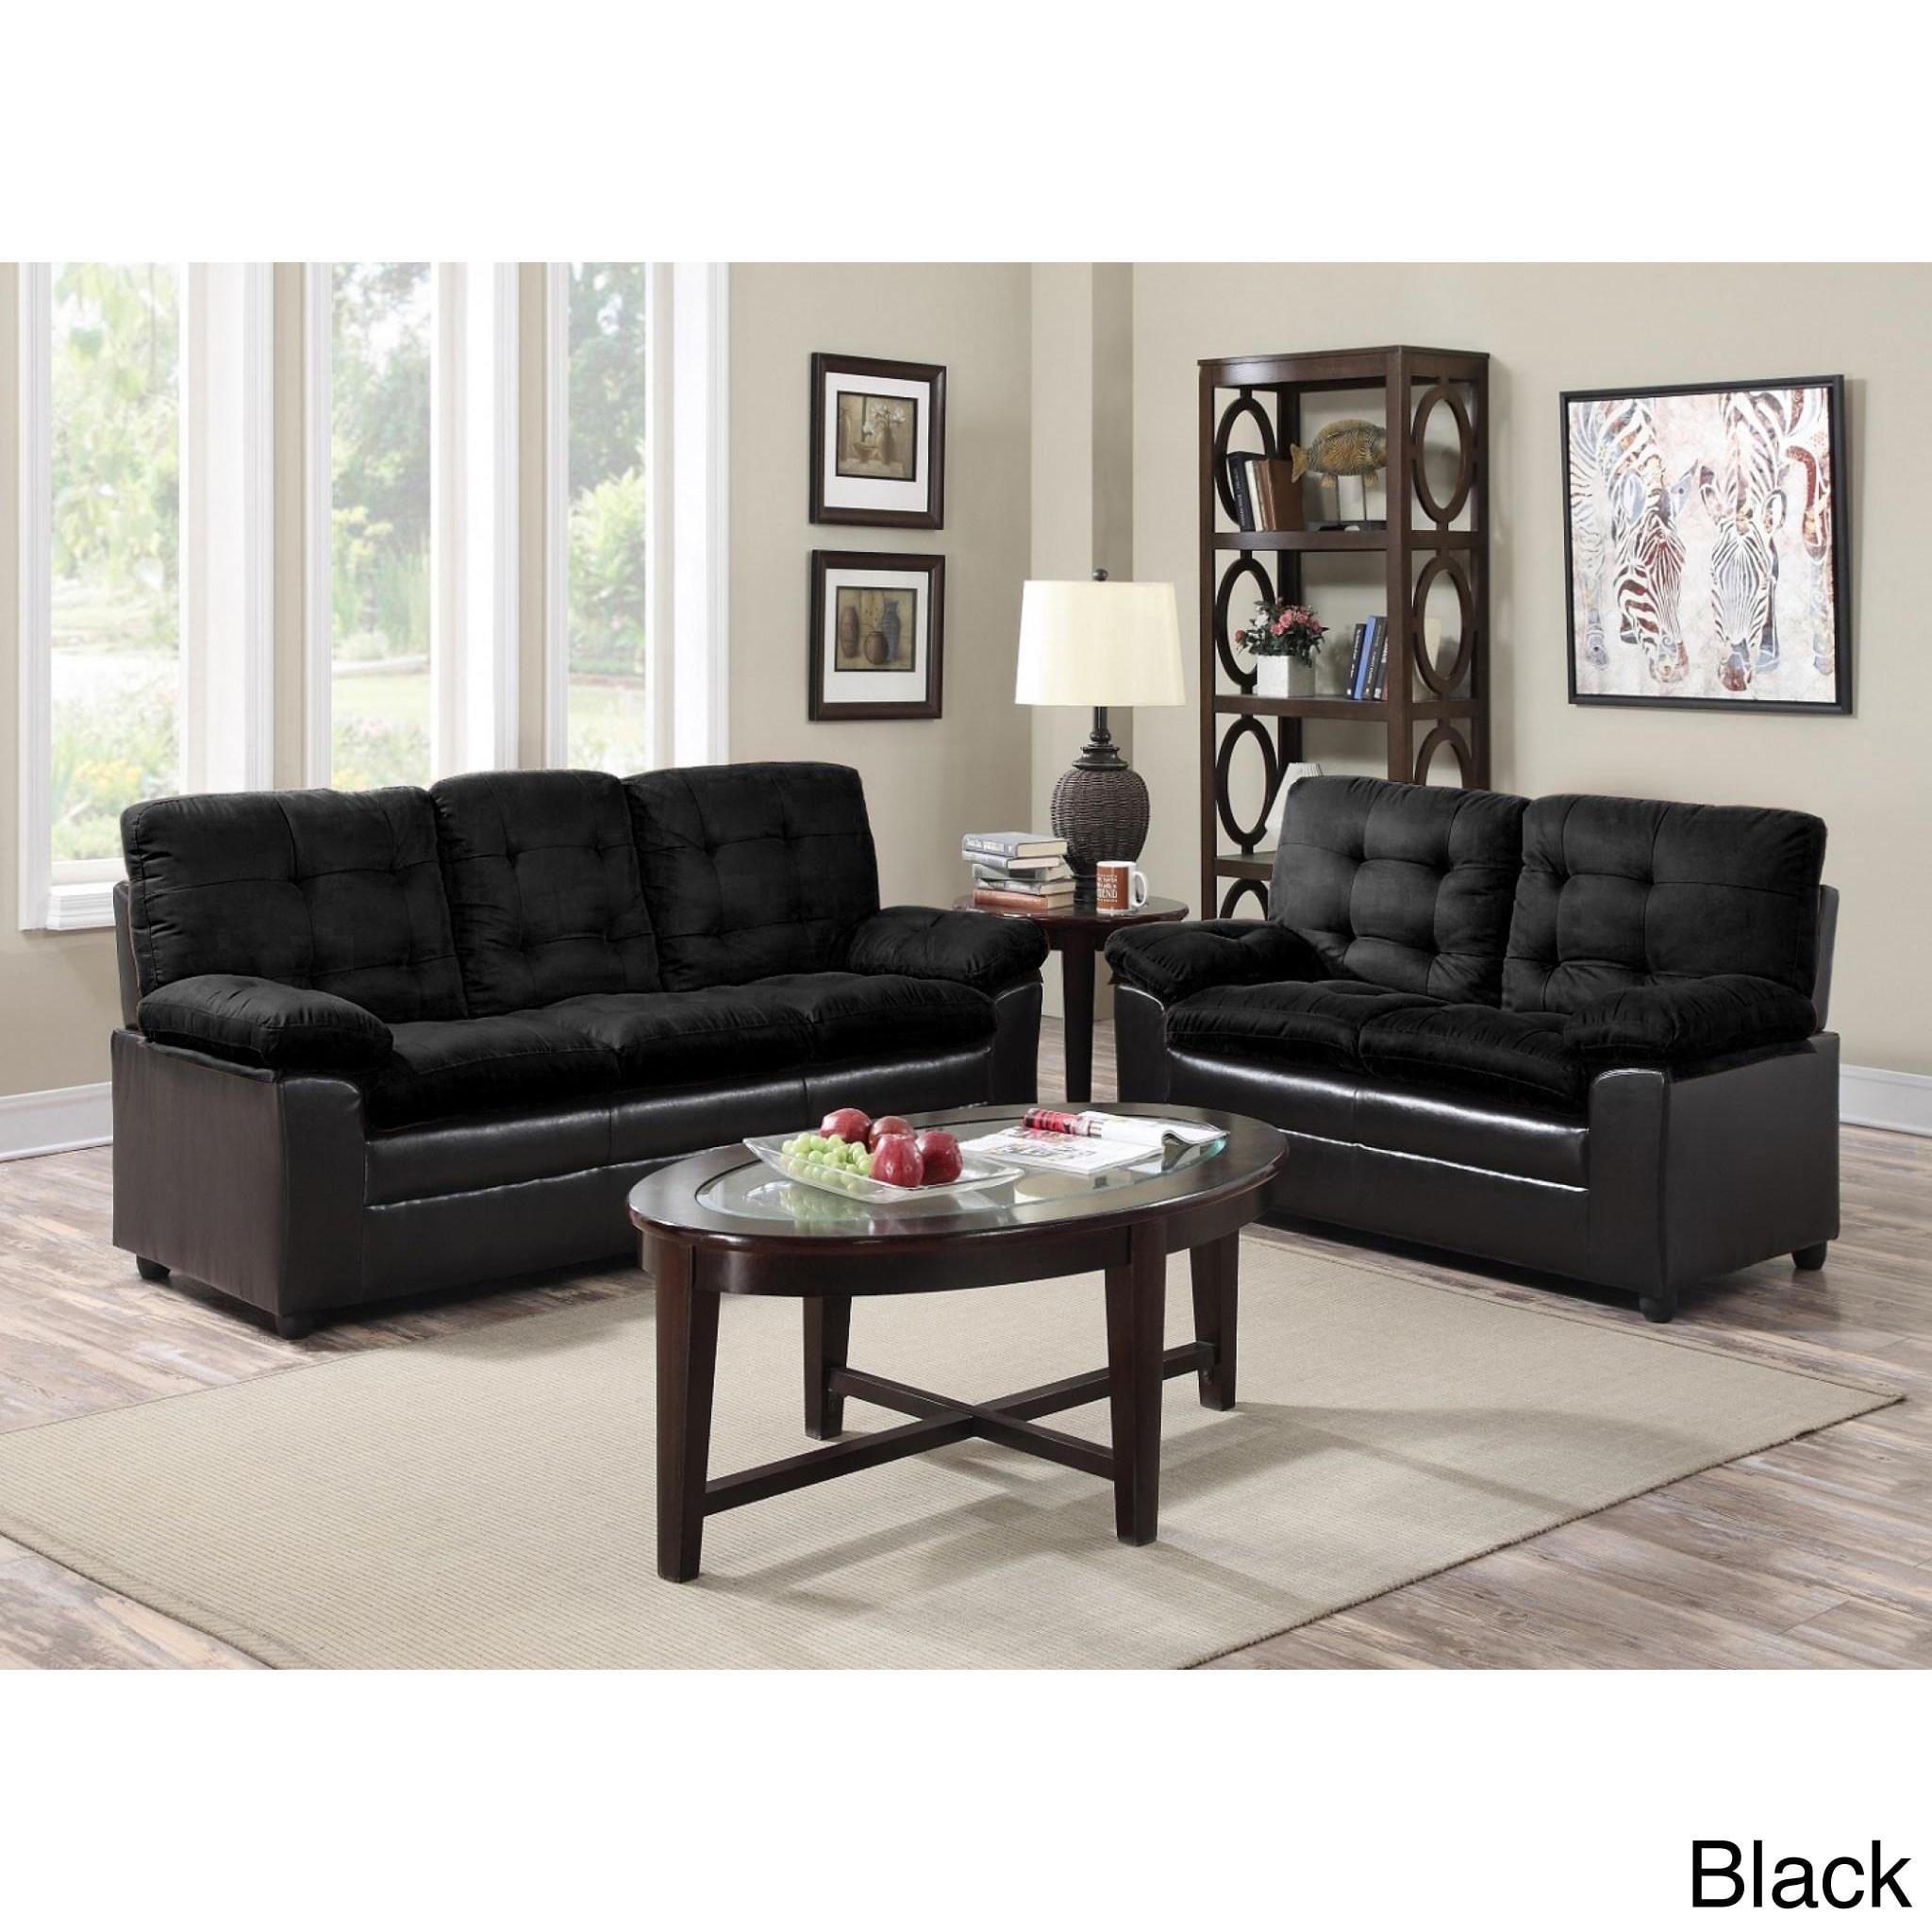 GTU Furniture Two Tone Microfiber Sofa and Loveseat Set Walmart